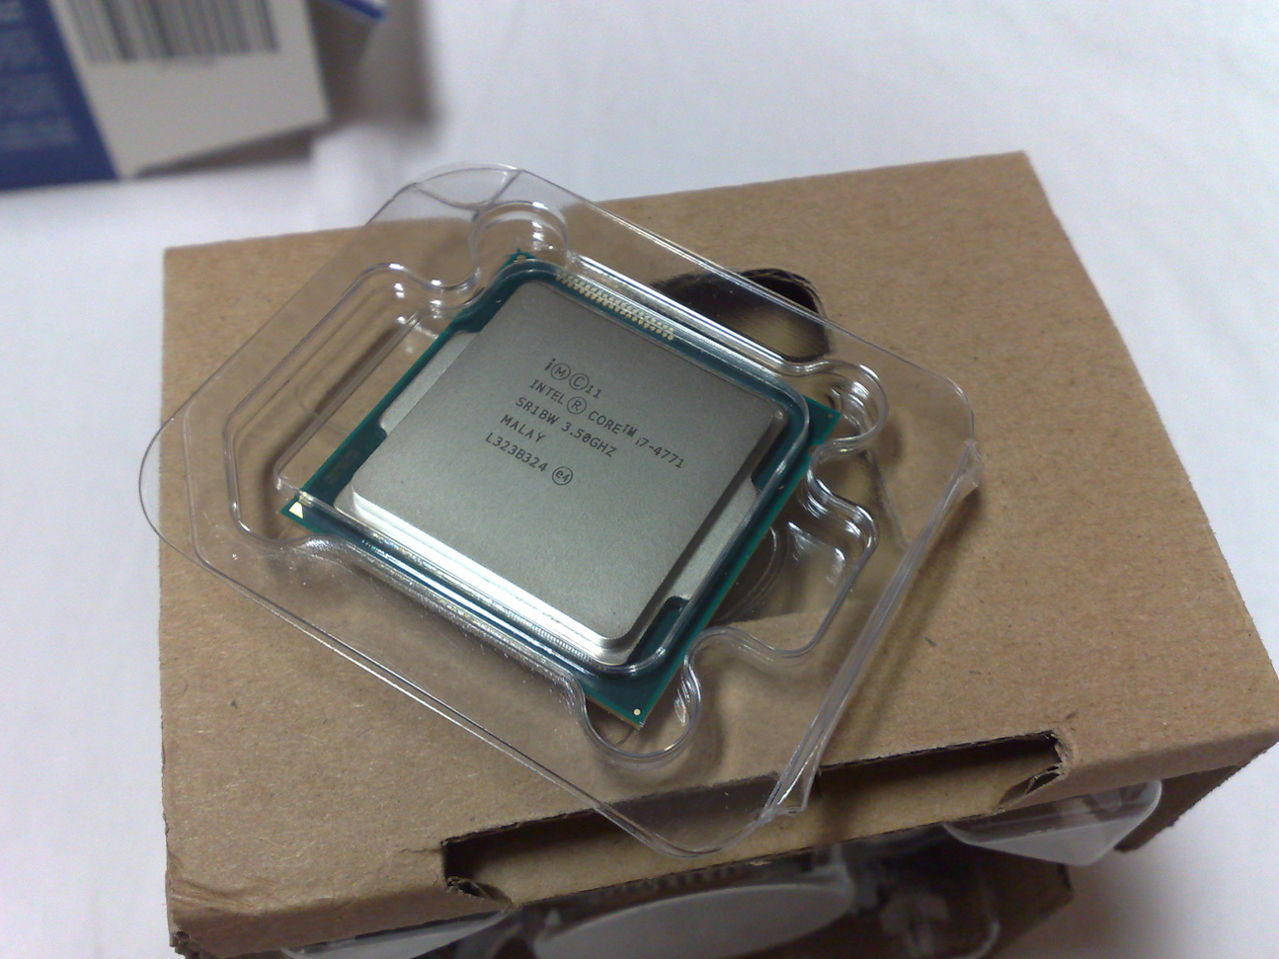 Intel Whitley Cpu